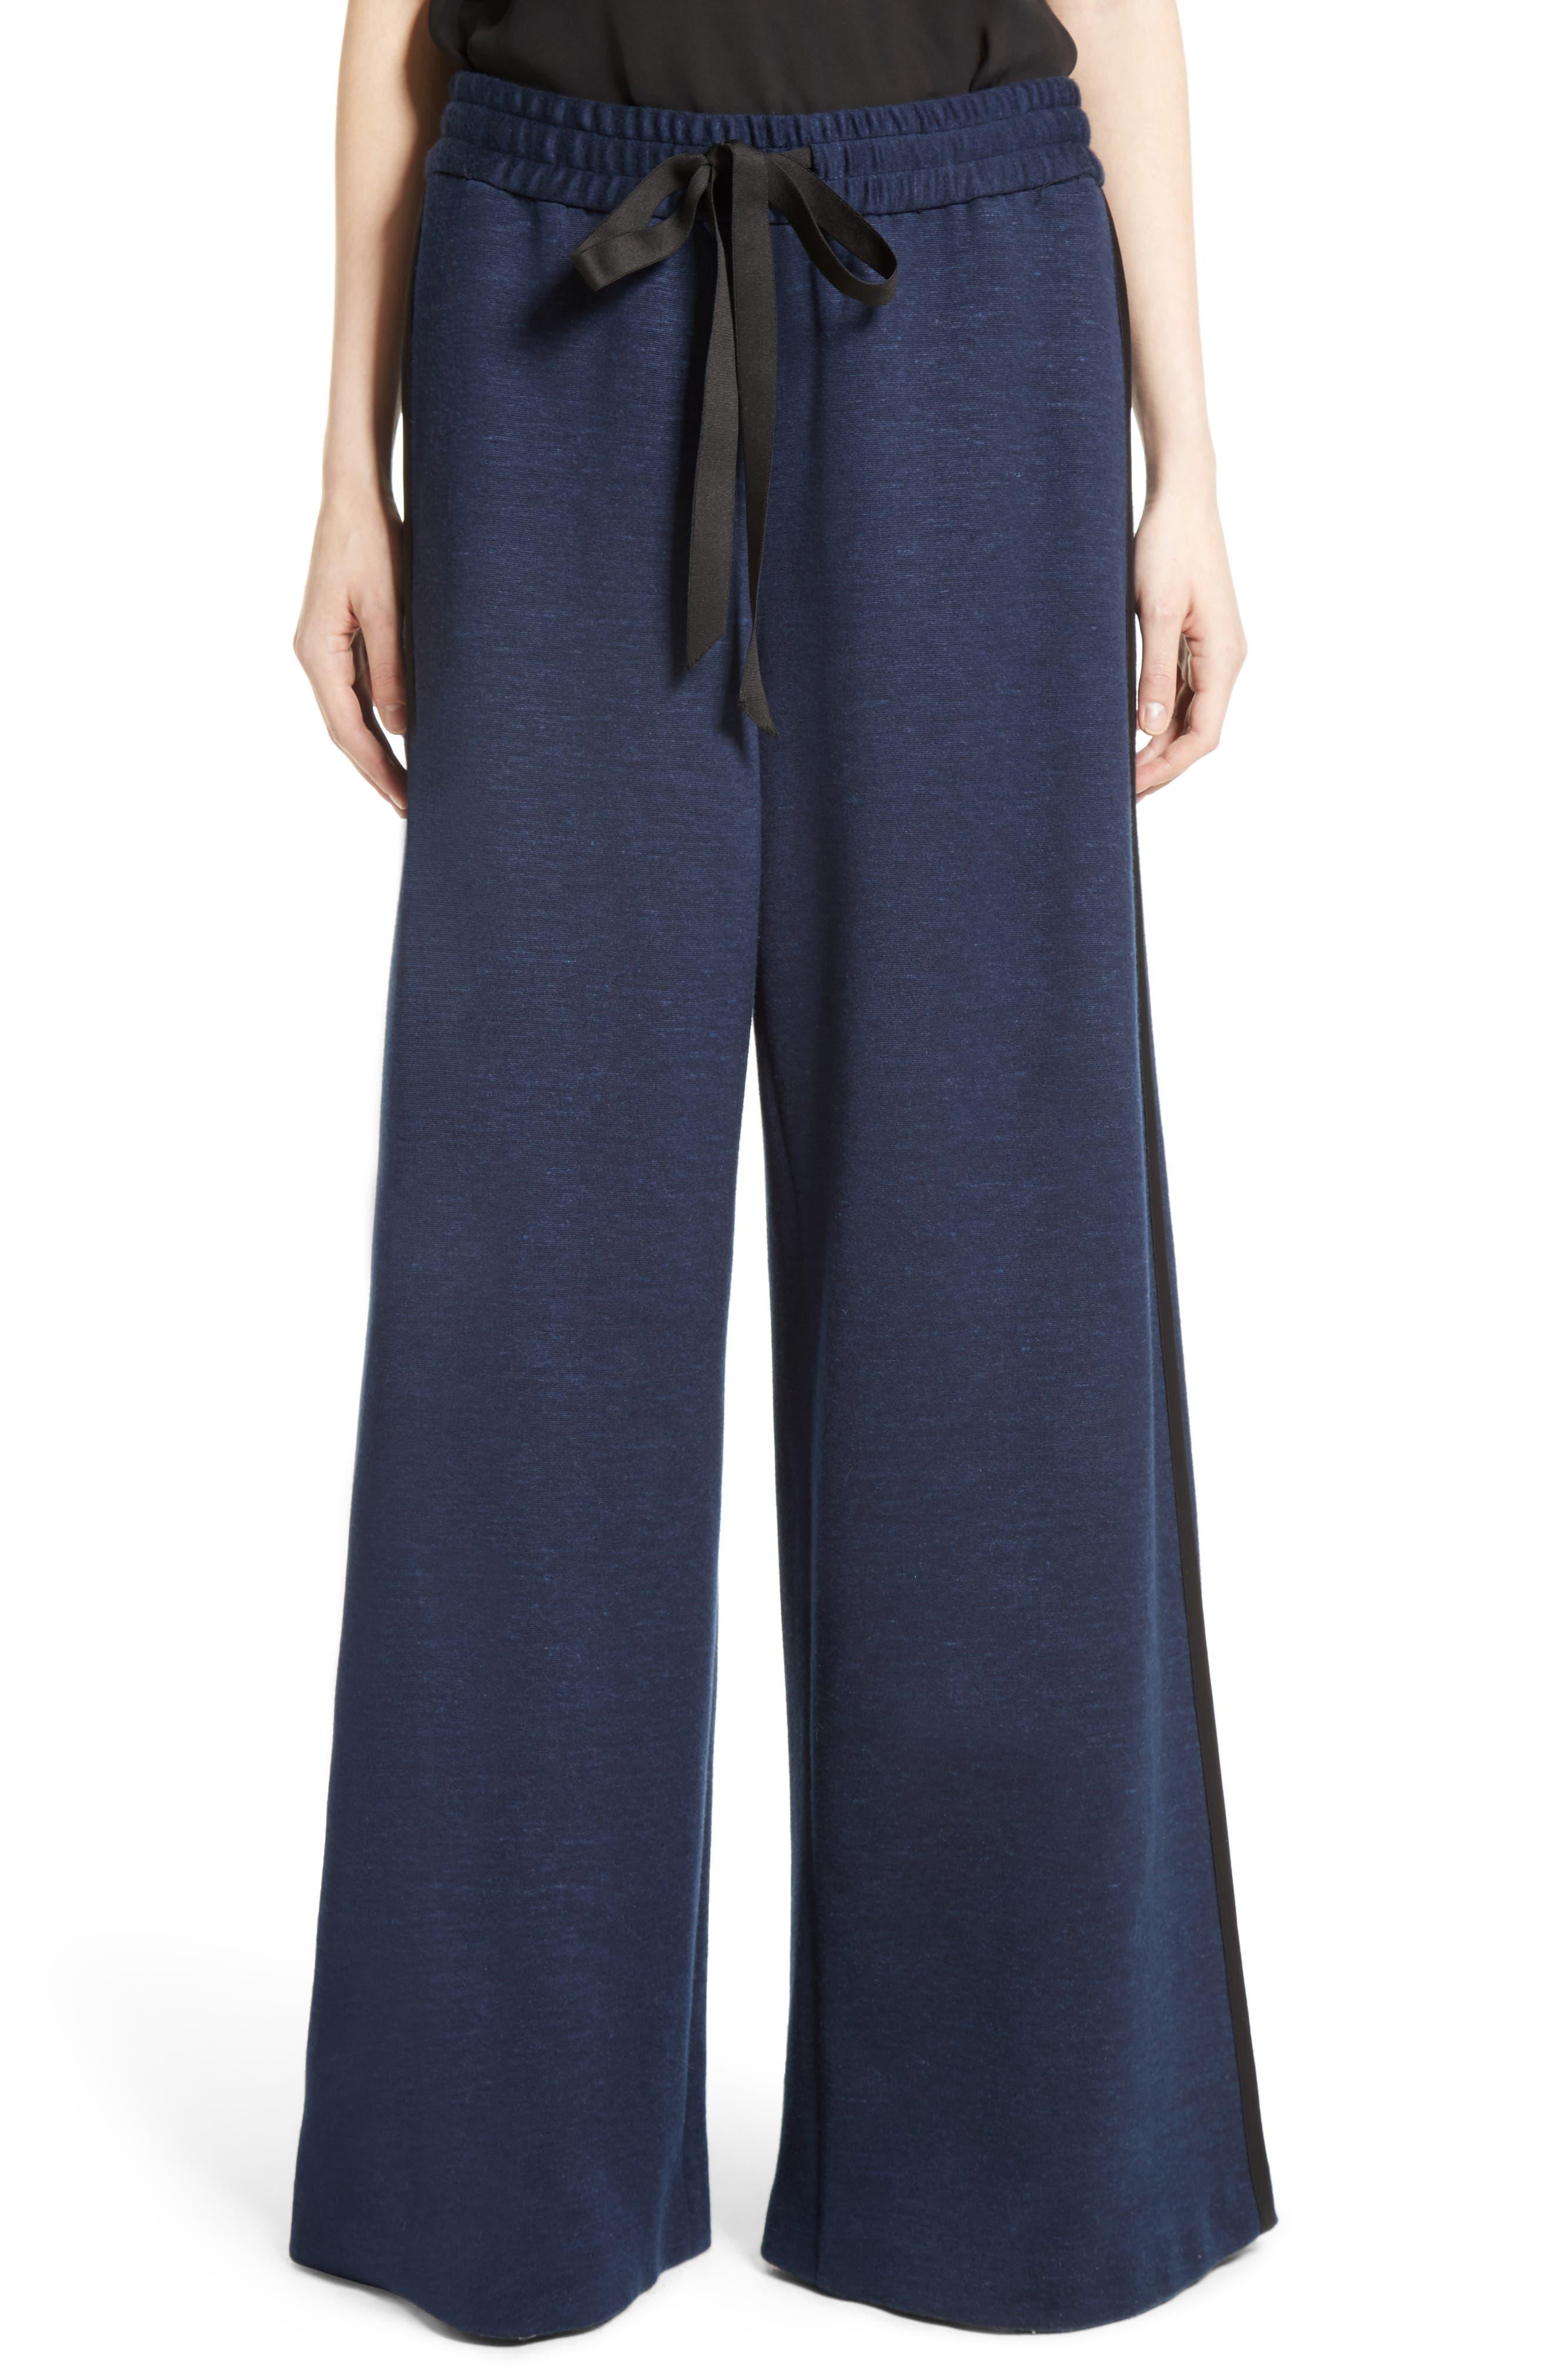 Alternate Image 1 Selected - Adam Lippes Jersey Wide Leg Drawstring Pants